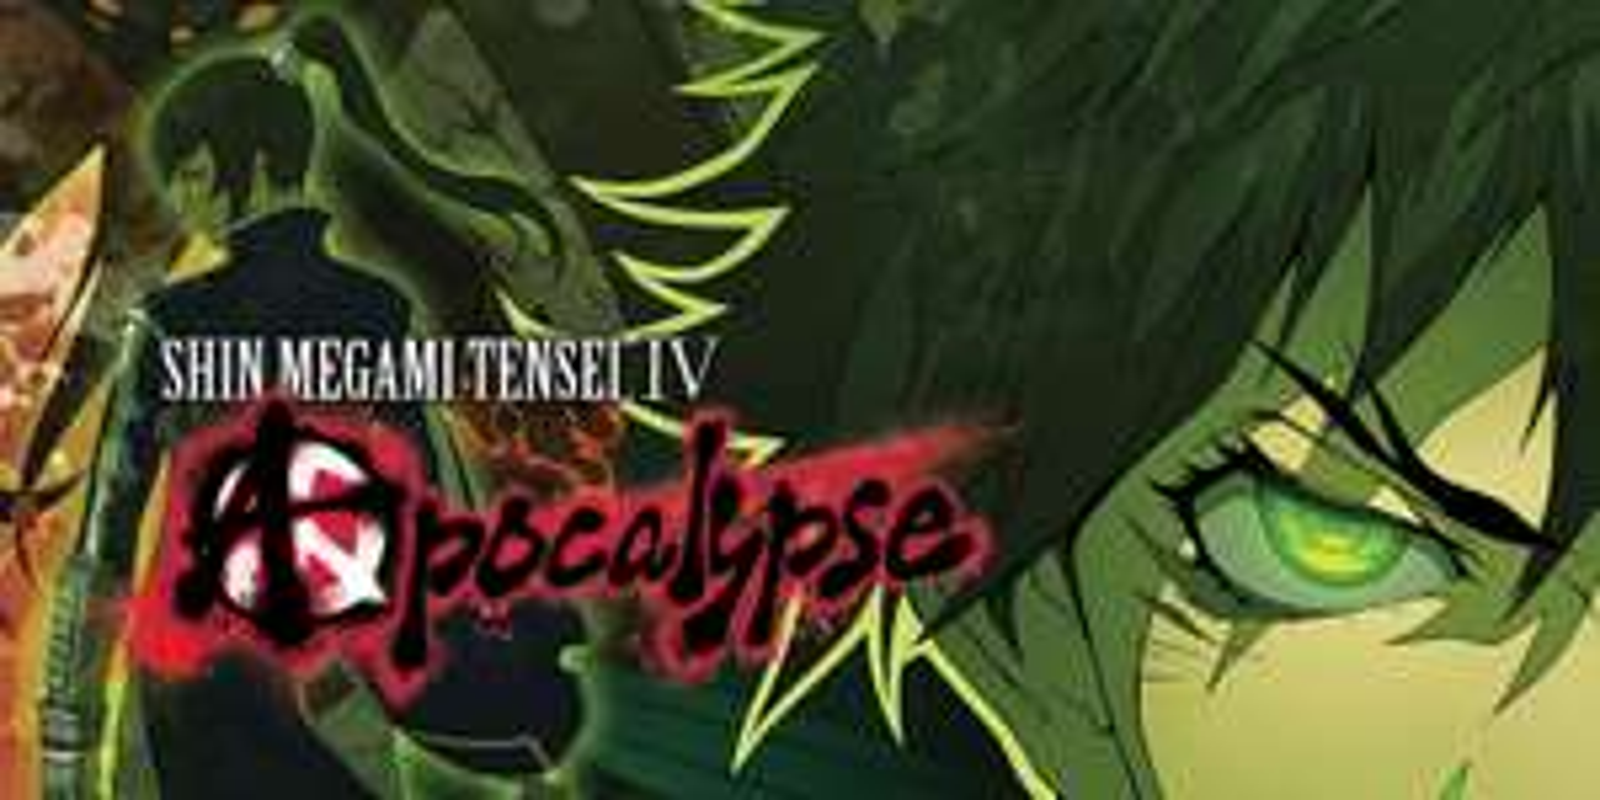 Shin Megami Tensei IV: Apocalypse (Nintendo 2/3DS) digital download £17.49 @ Nintendo eShop